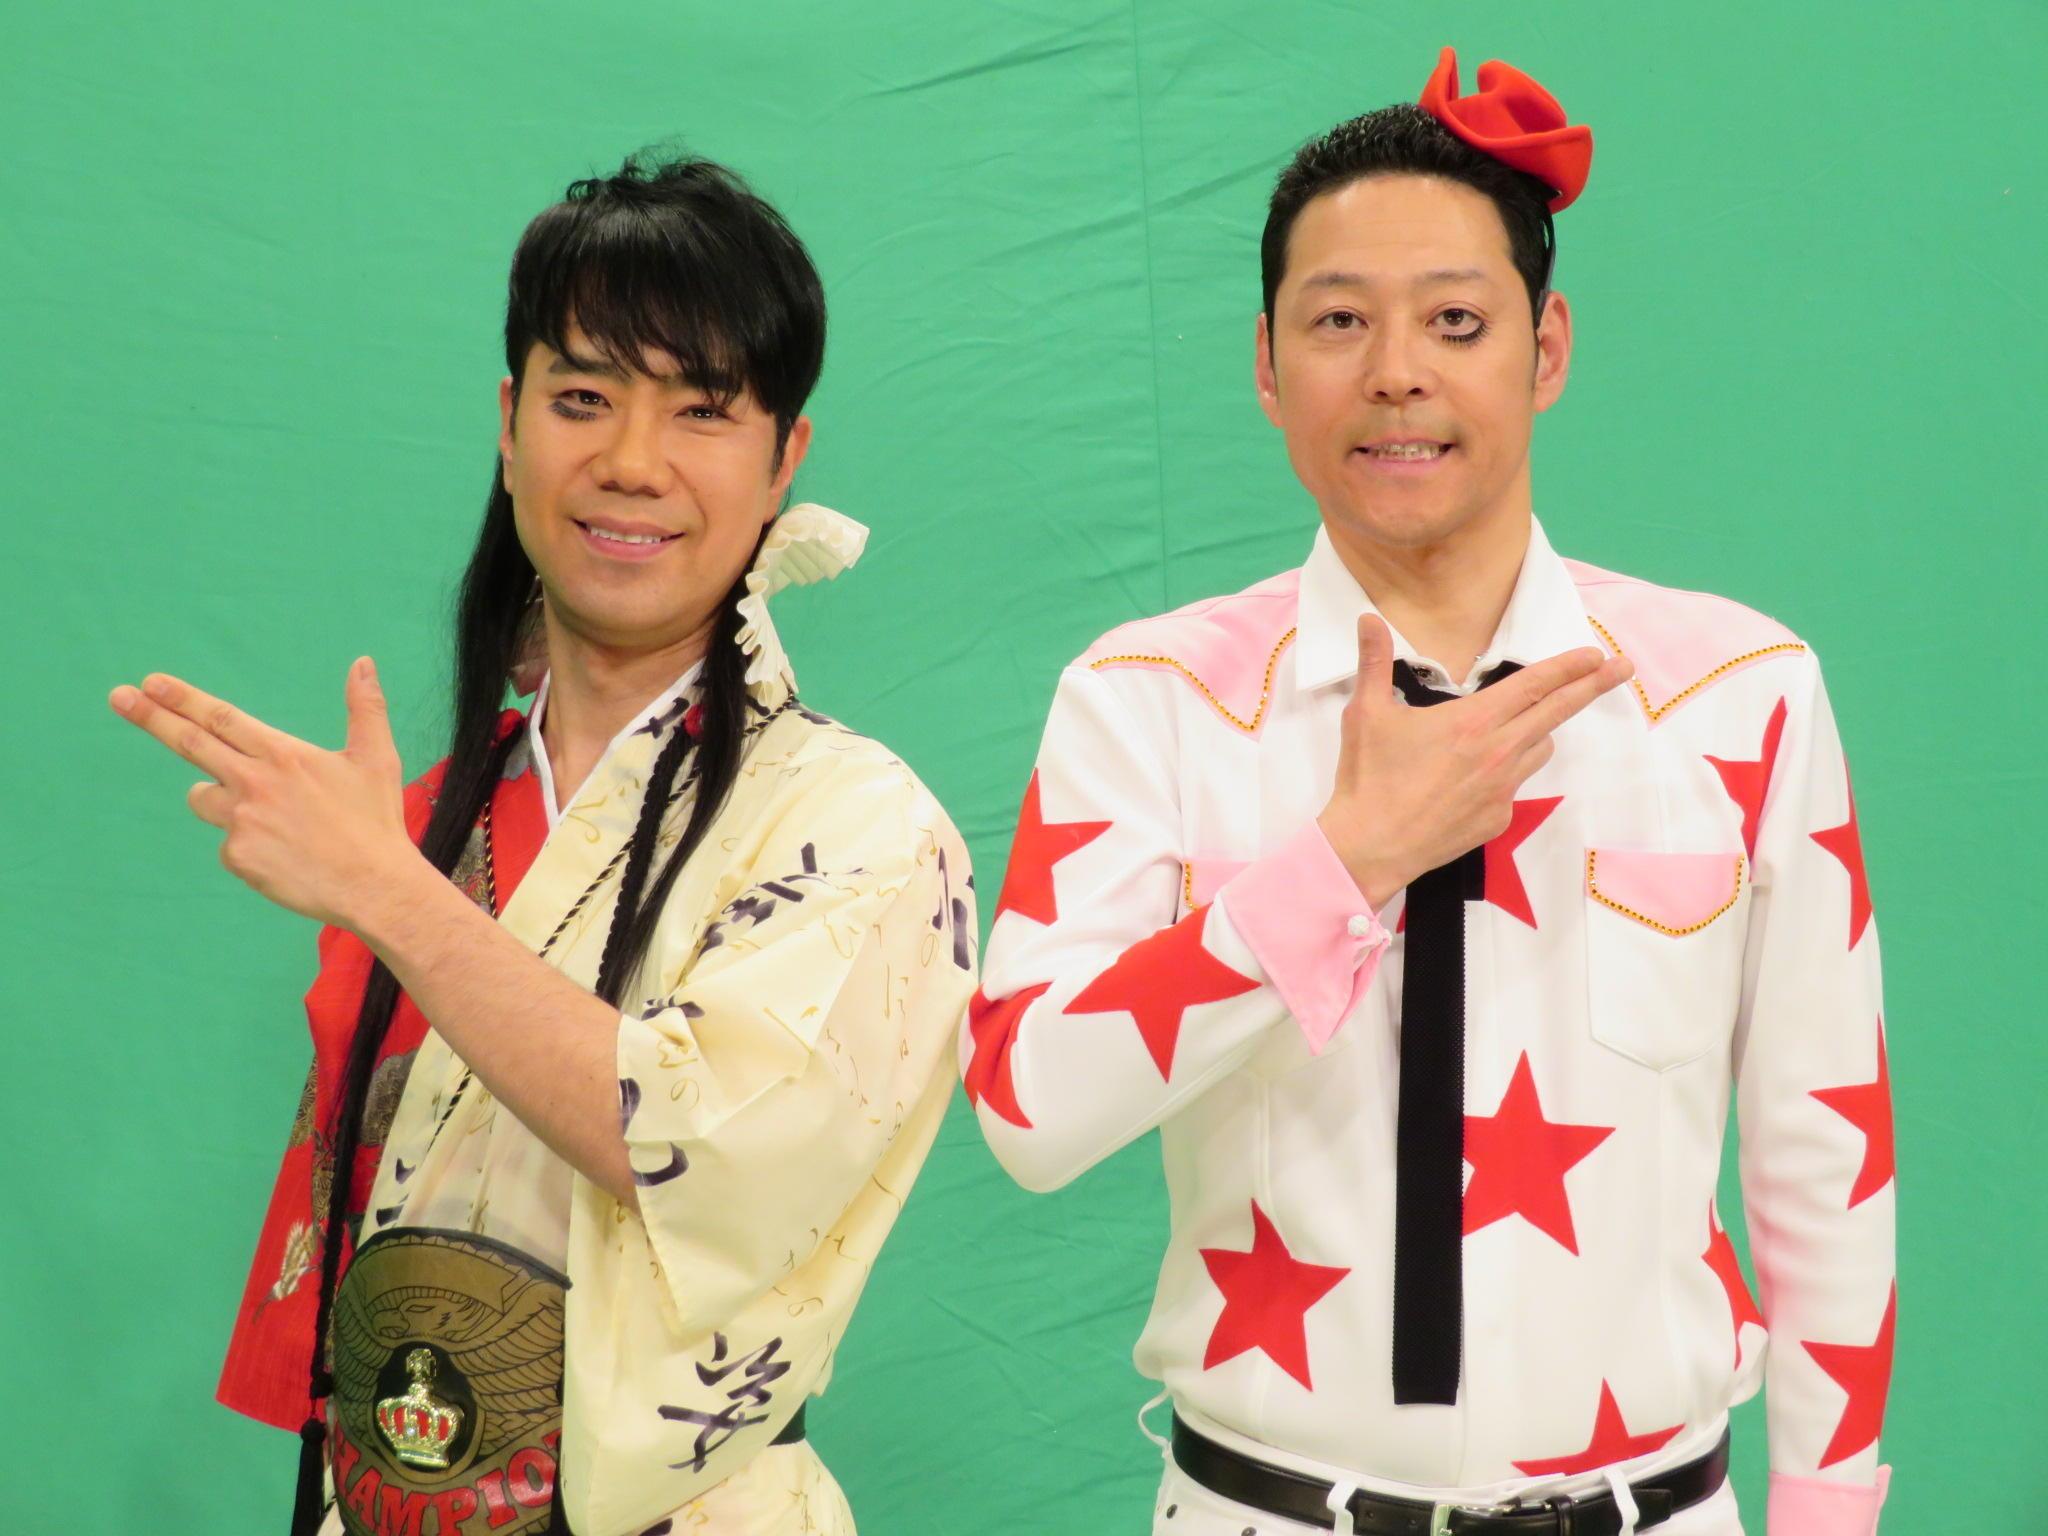 http://news.yoshimoto.co.jp/20180412230731-7de81802b16d044034cdb99fad1401f296a300e8.jpg